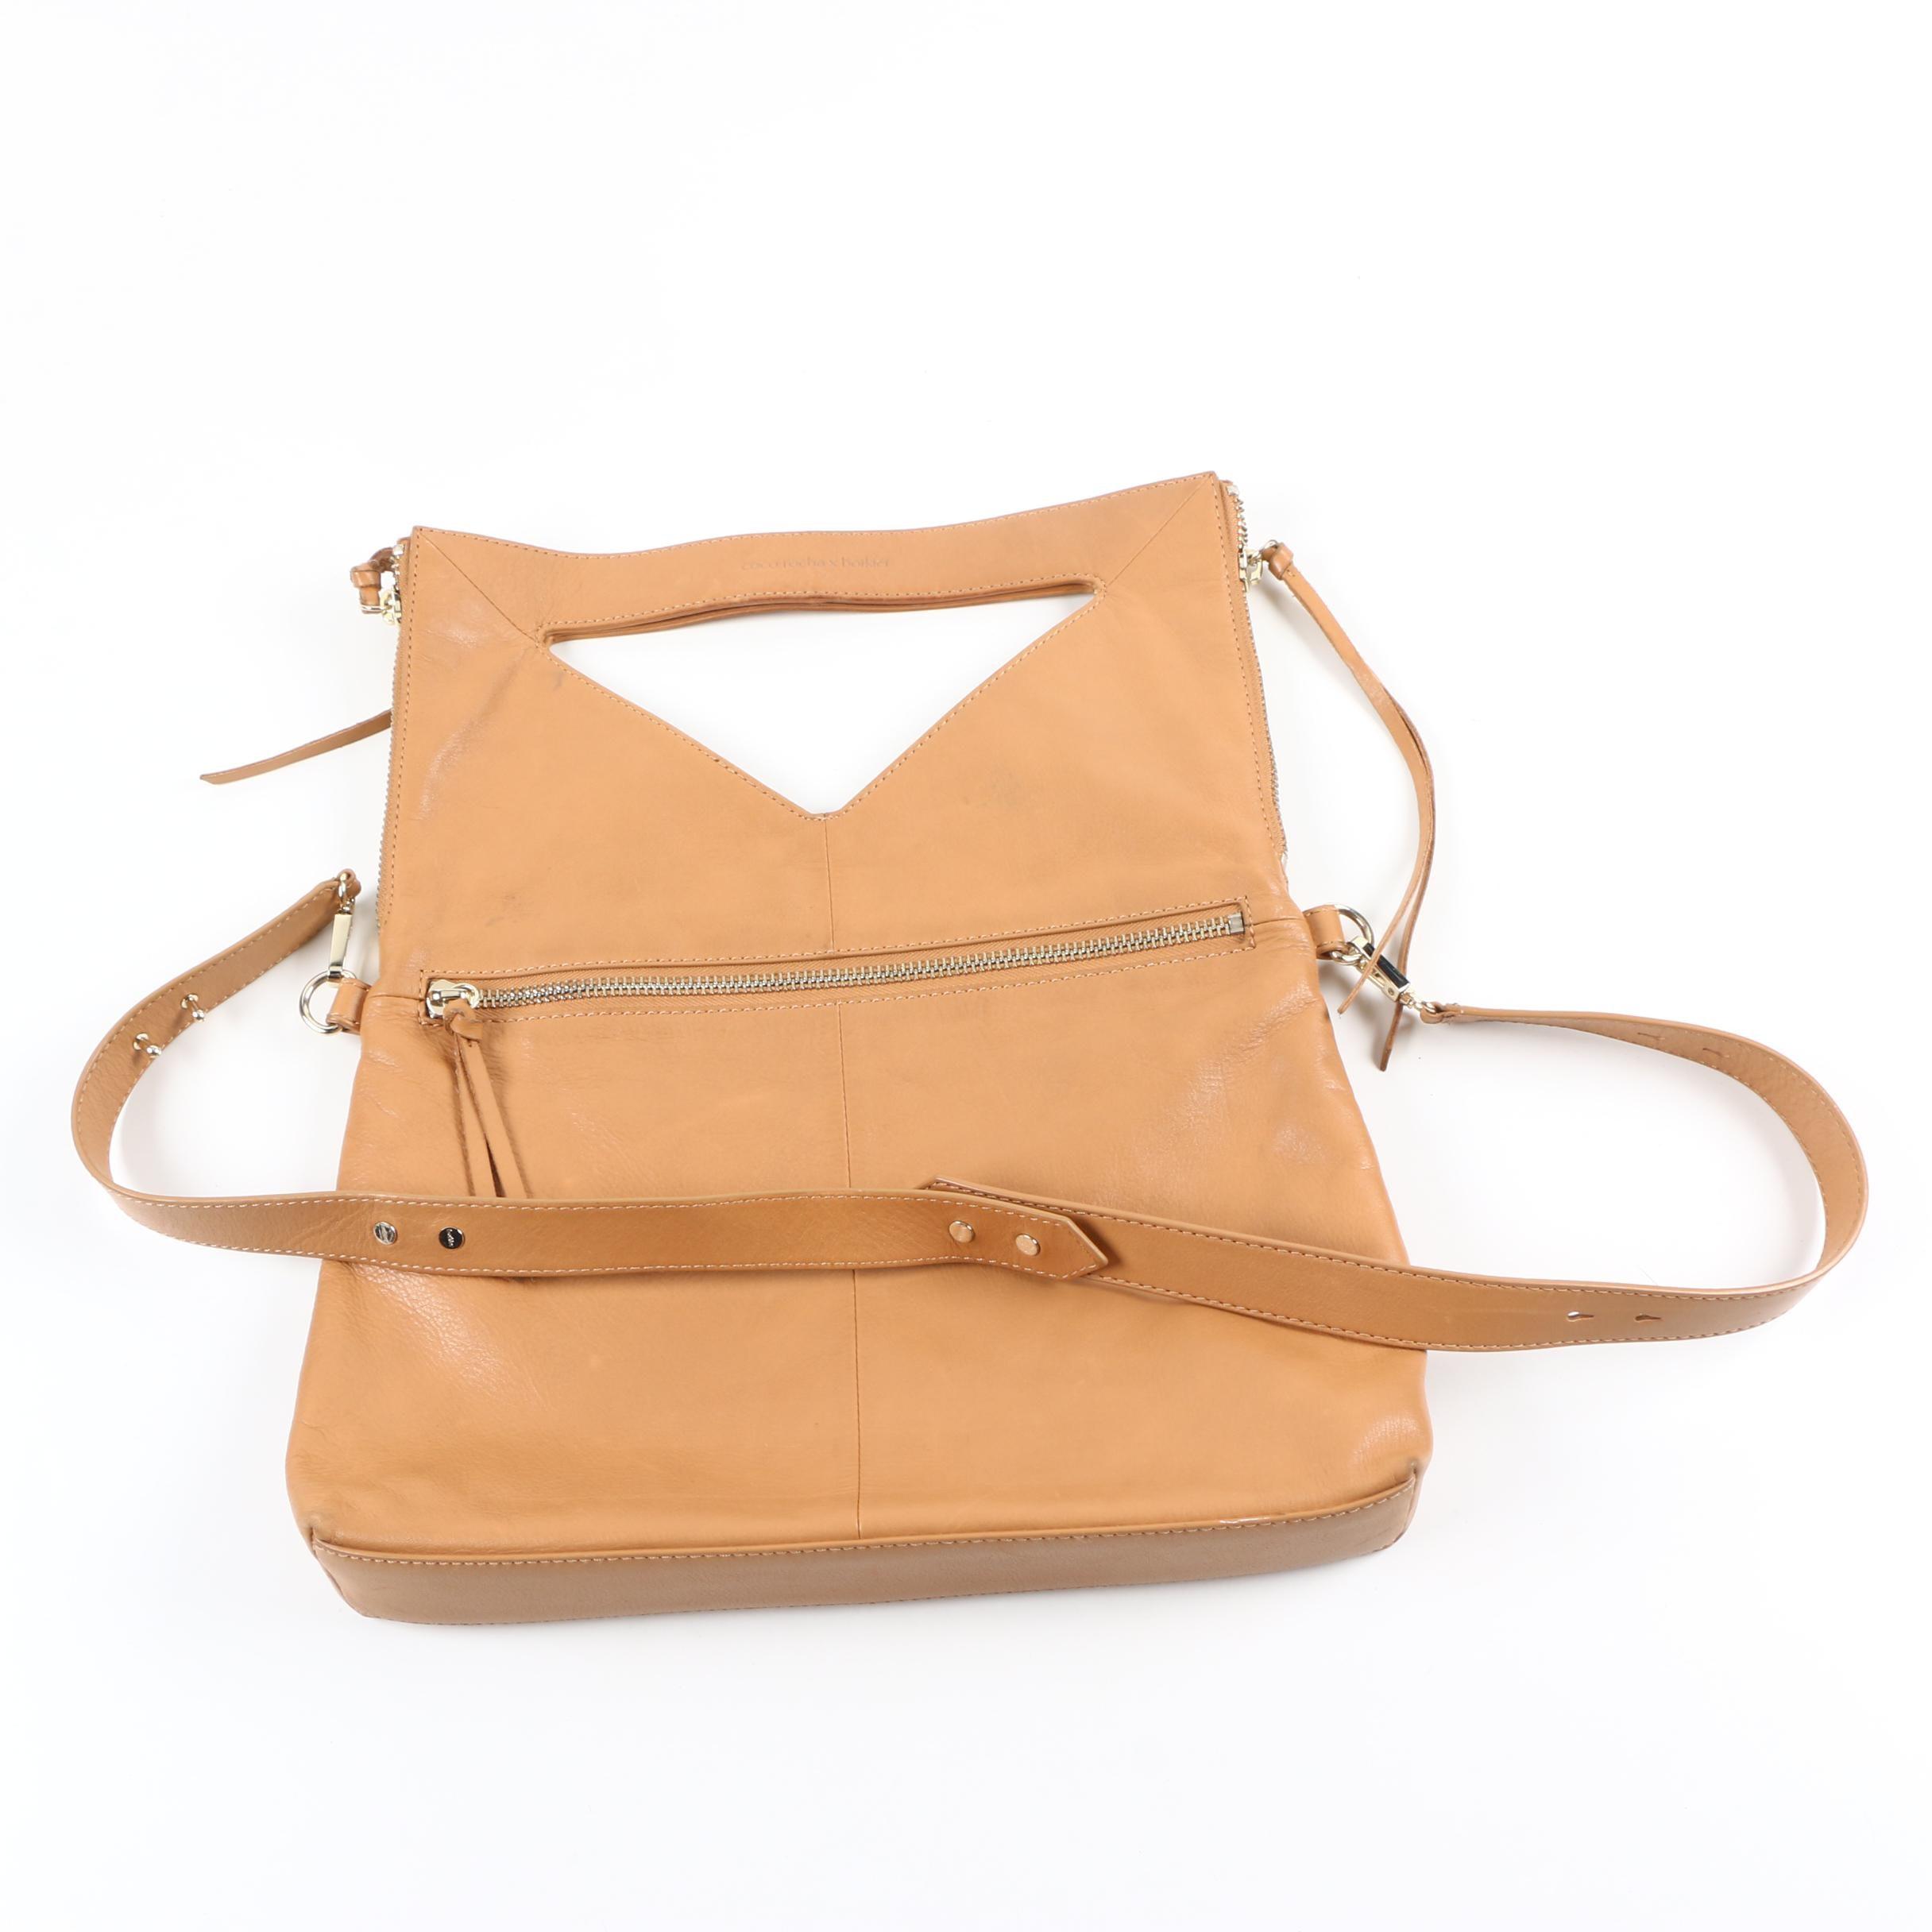 Coco Rocha for Botkier Leather Shoulder Bag